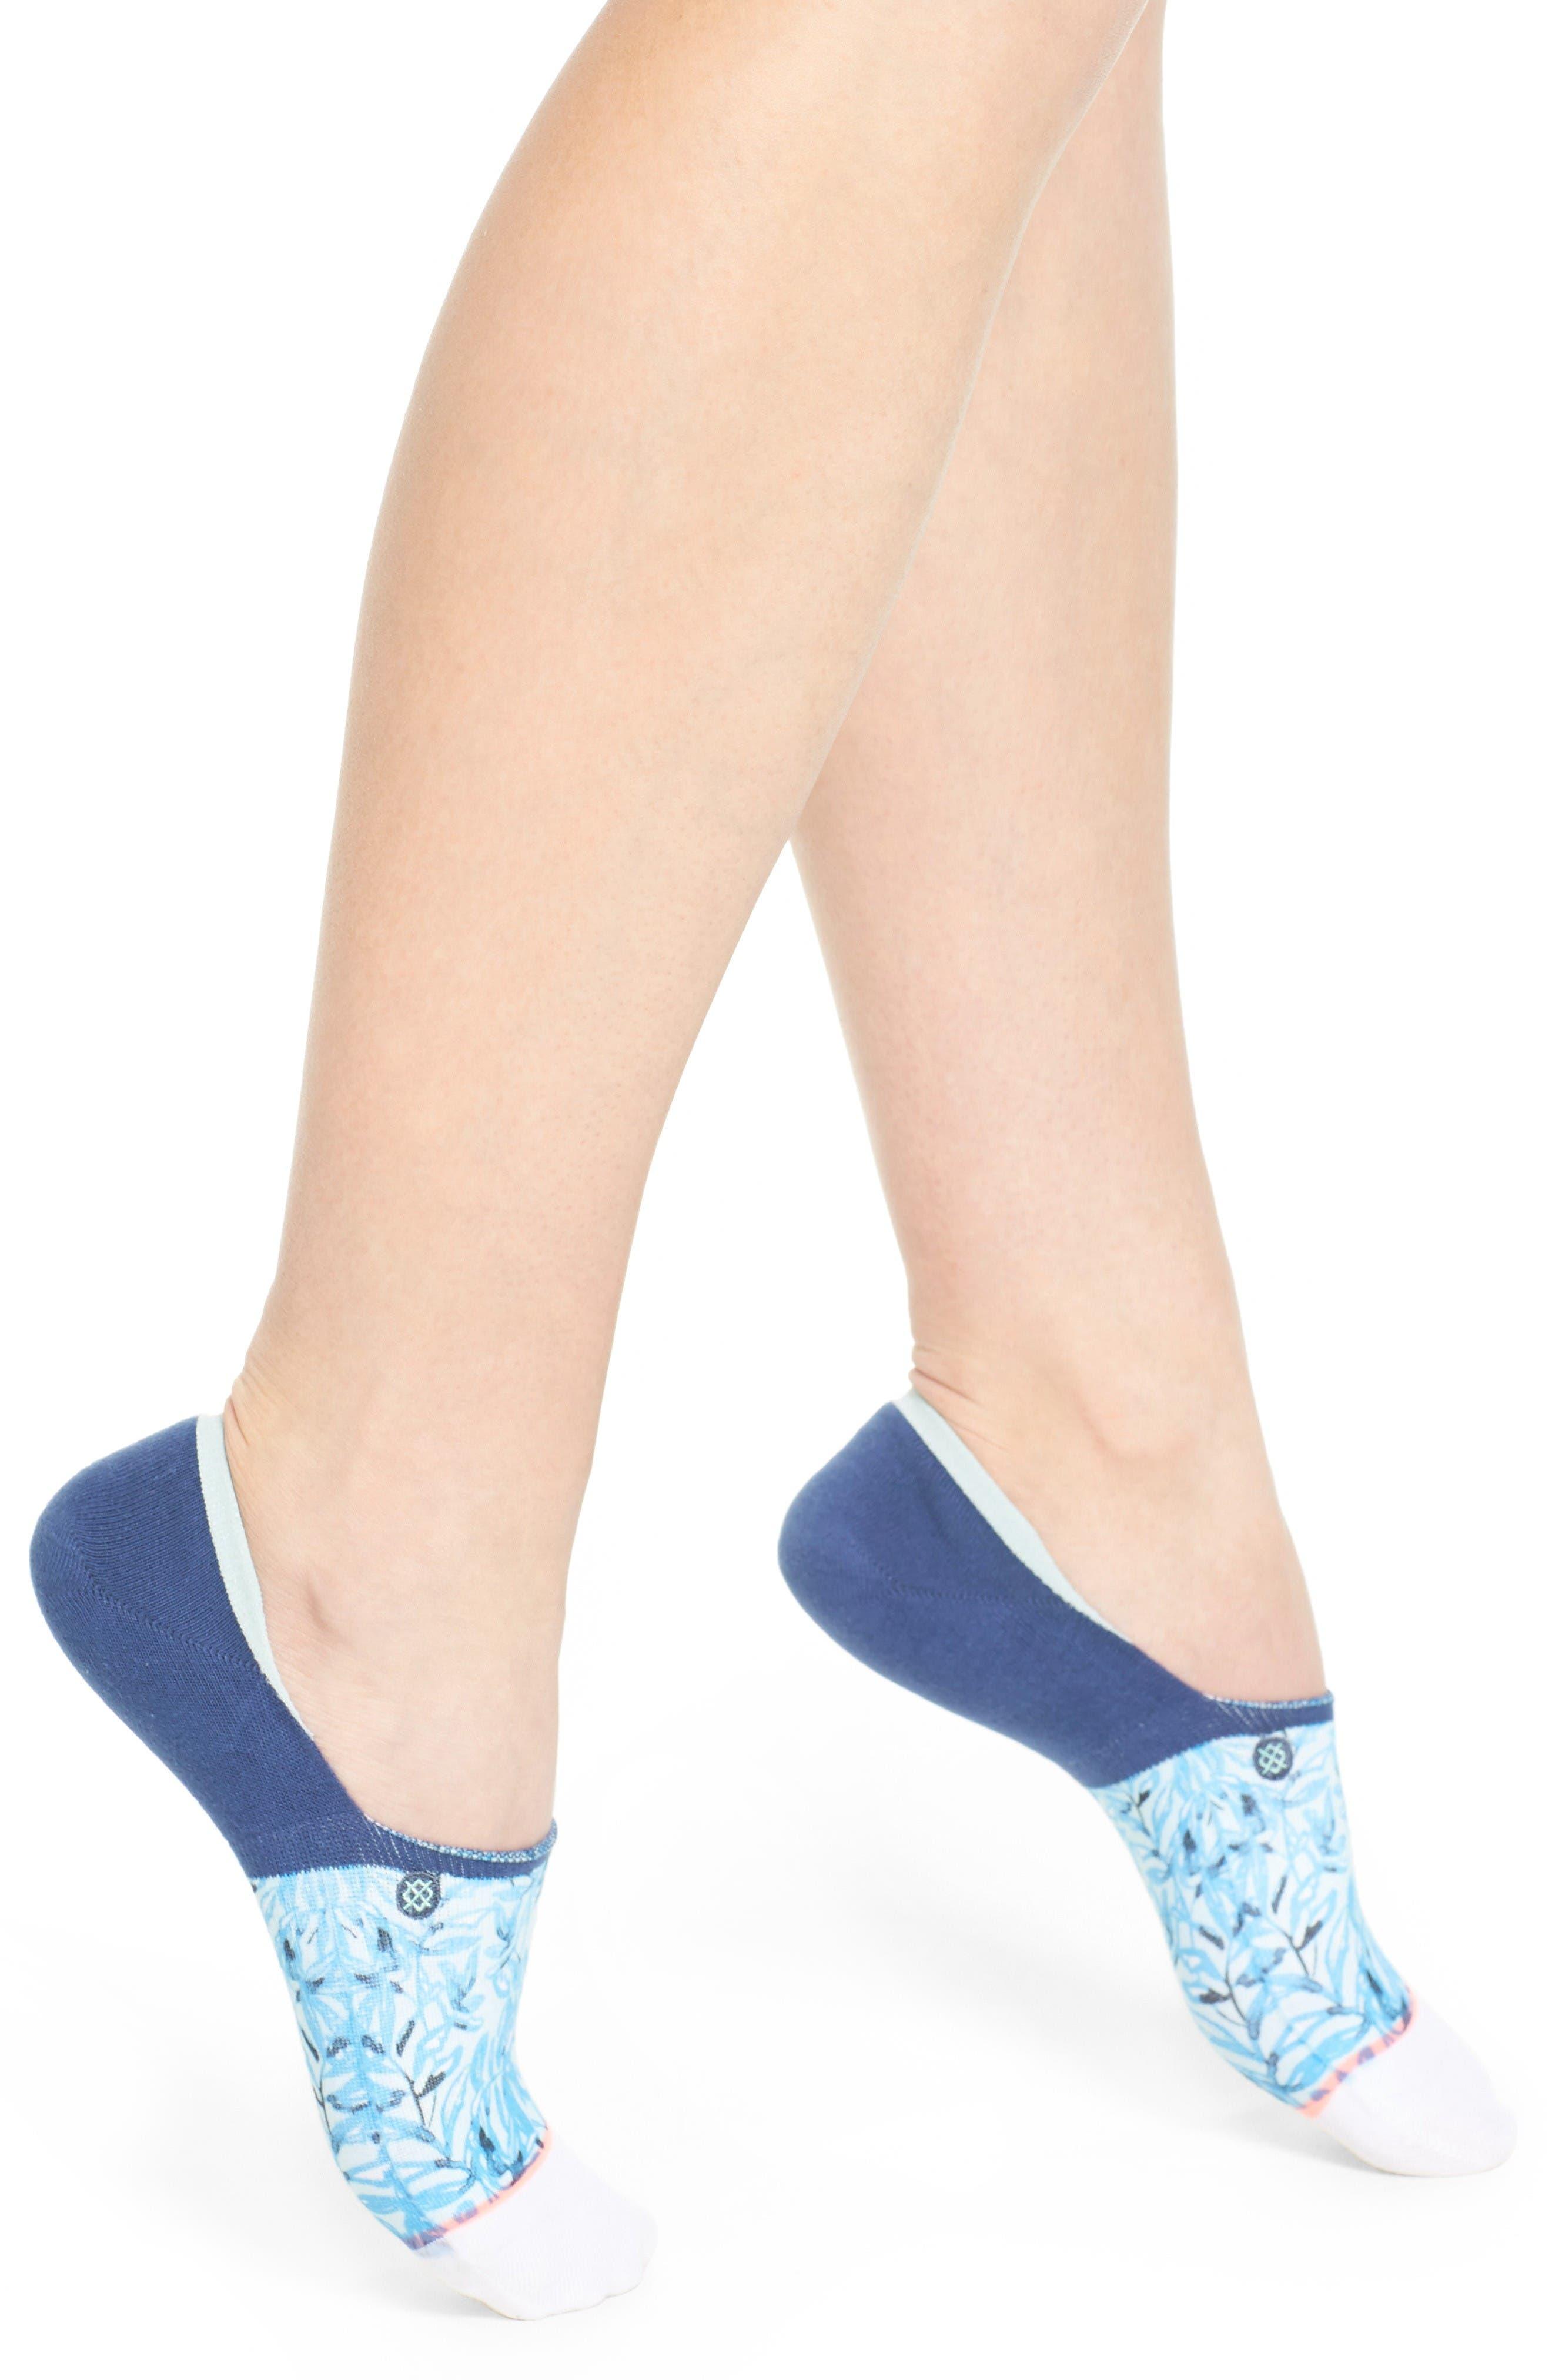 Stance Namagashi Super Invisible No-Show Socks